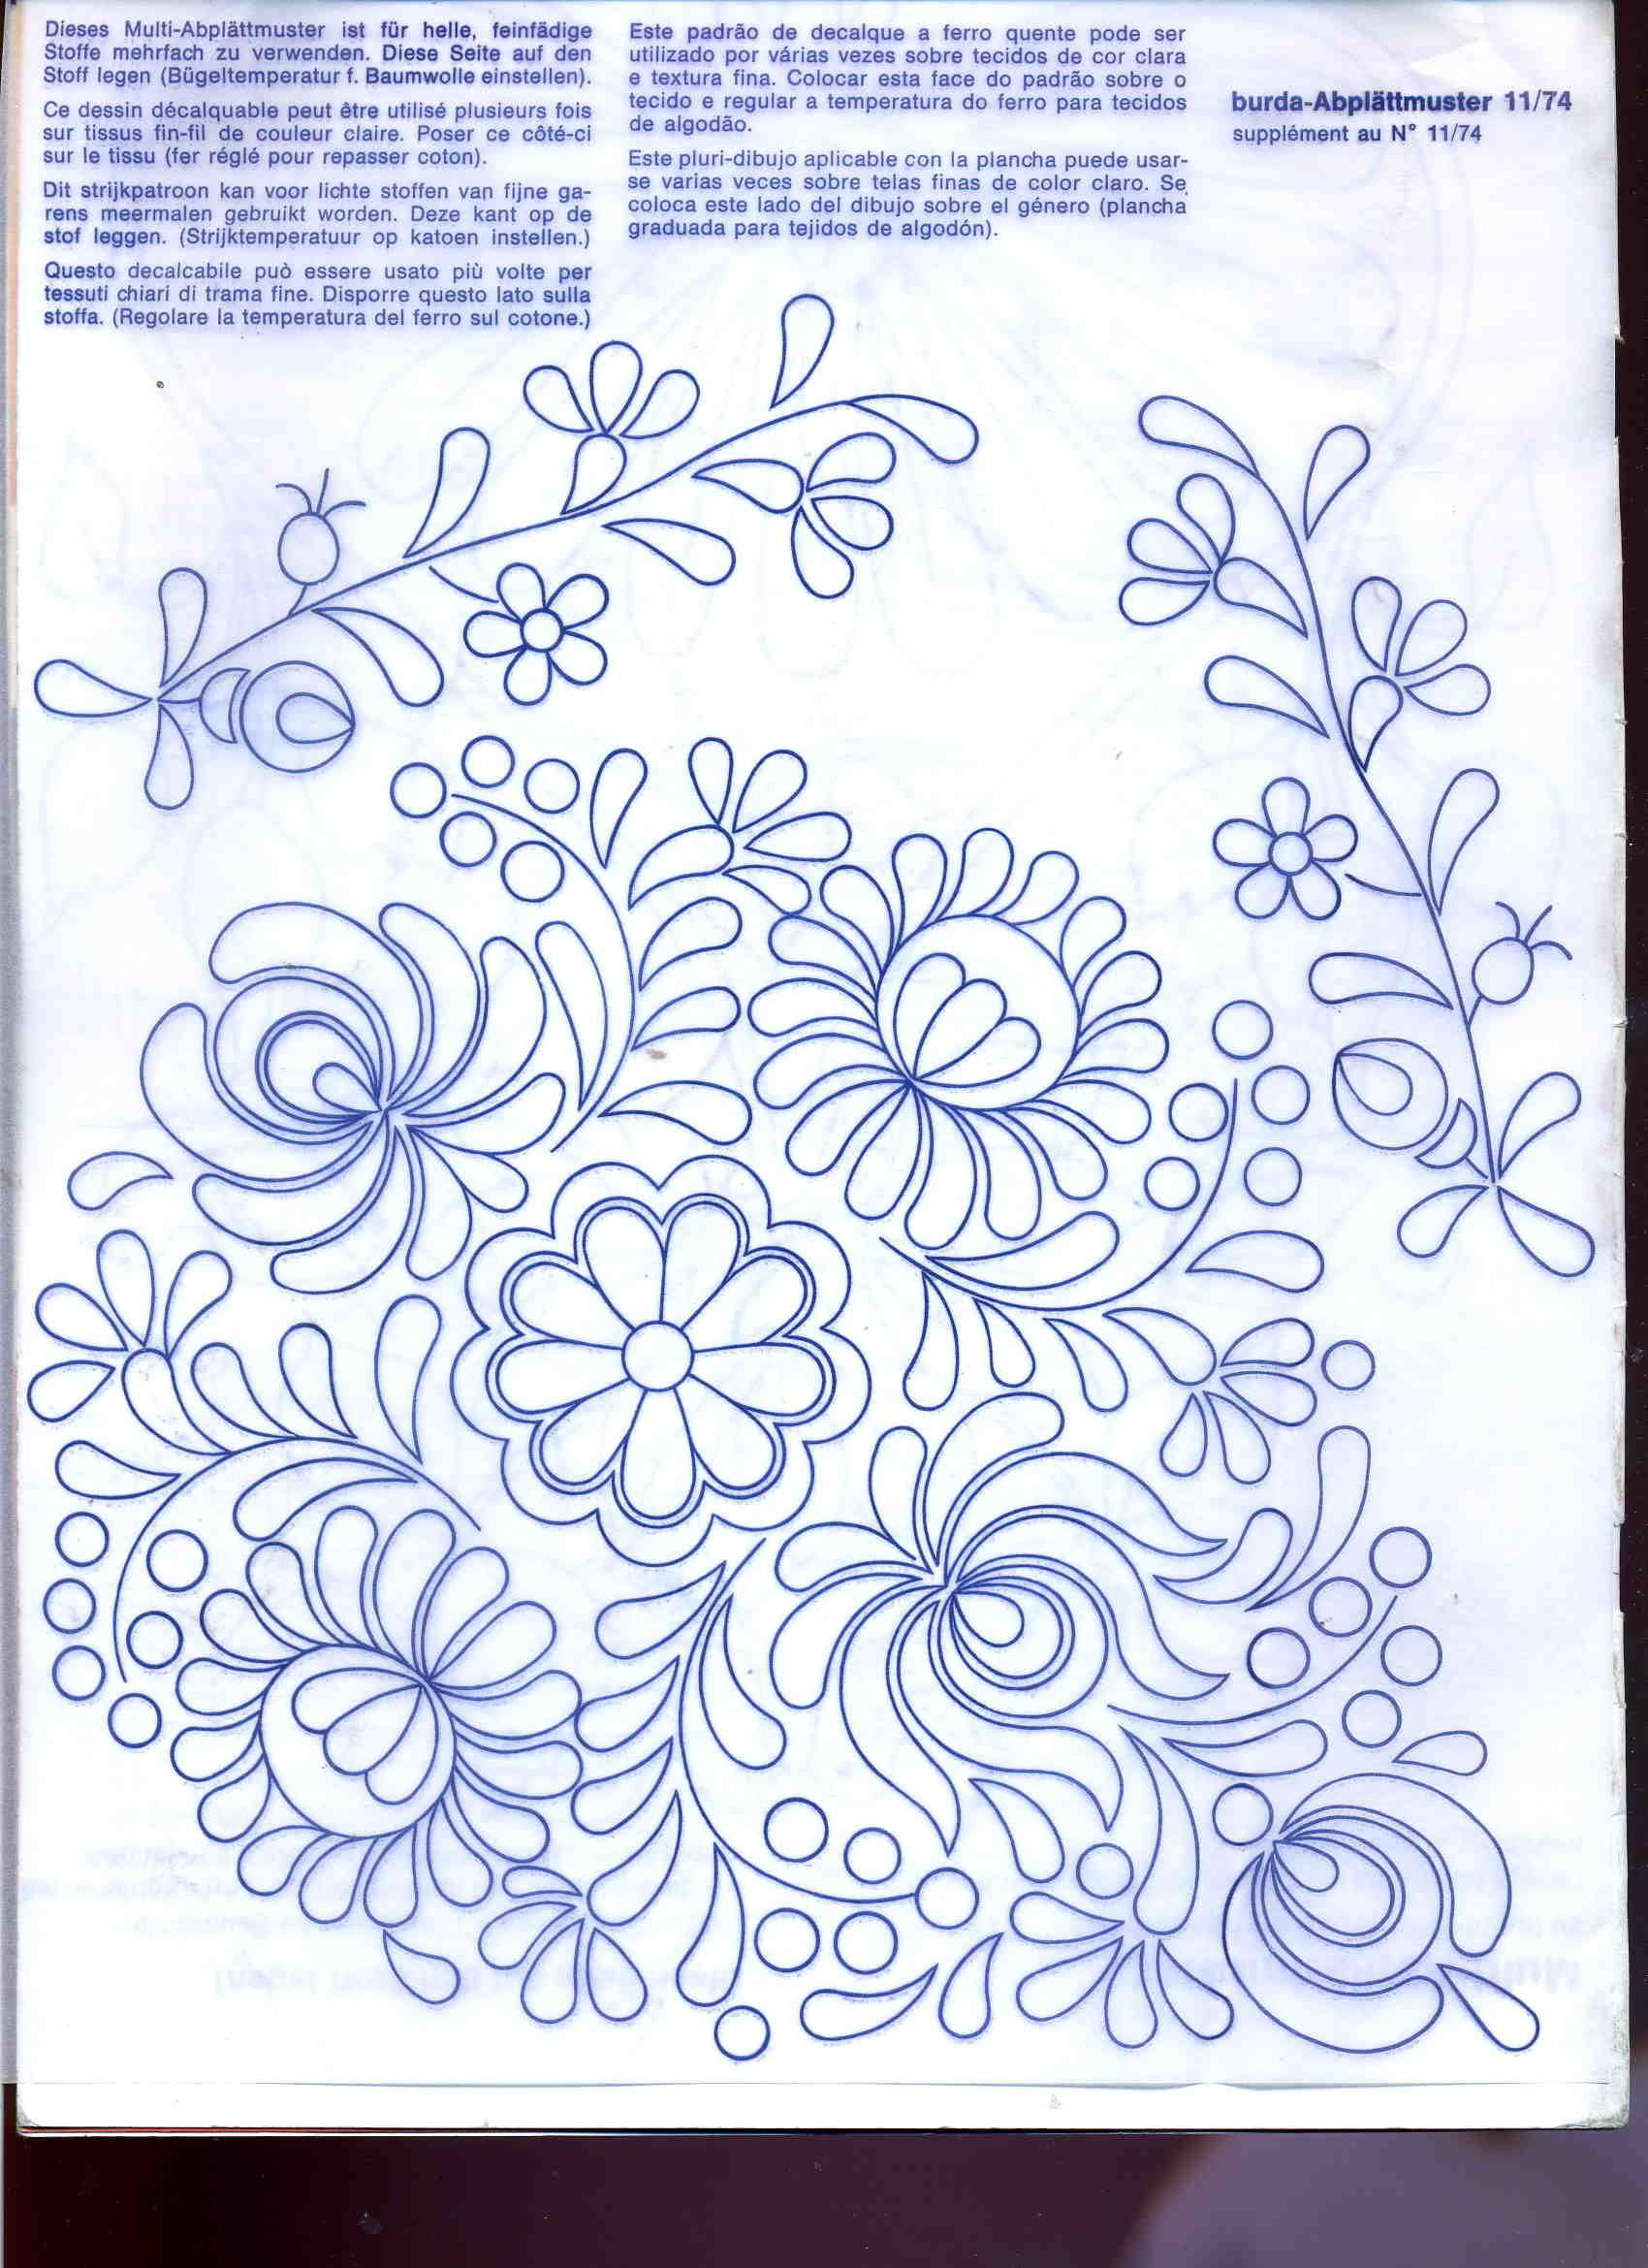 flowers | bordado | Pinterest | Patrones de bordado, Bordado y ...